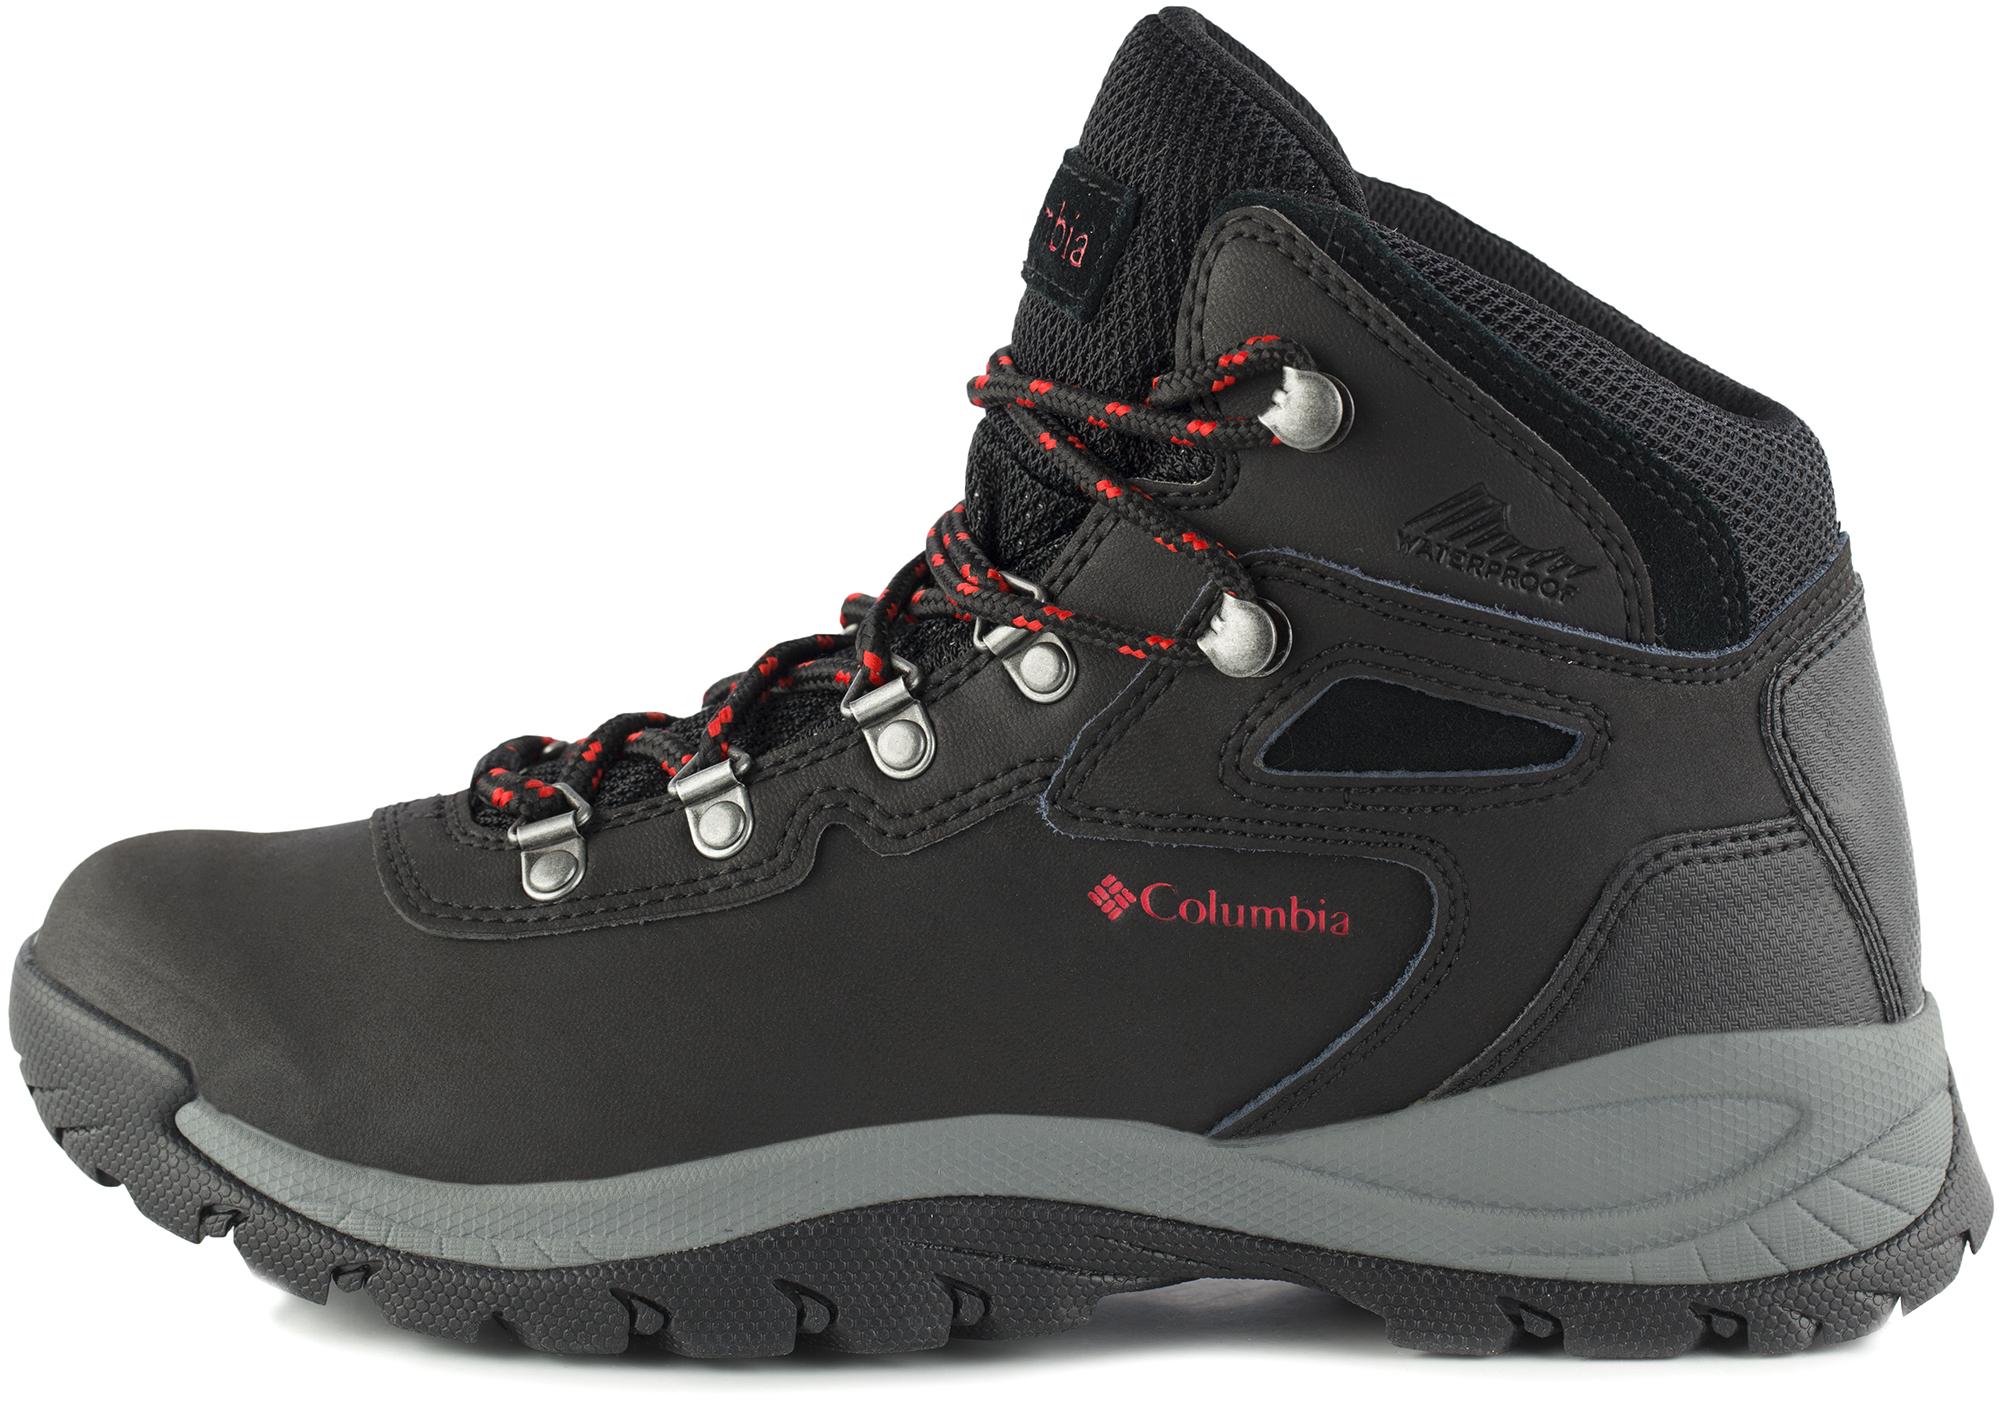 Columbia Ботинки женские Columbia Newton Ridge Plus, размер 37 ботинки мужские columbia newton ridge plus ii suede wp цвет зеленый 1746411 213 размер 9 42